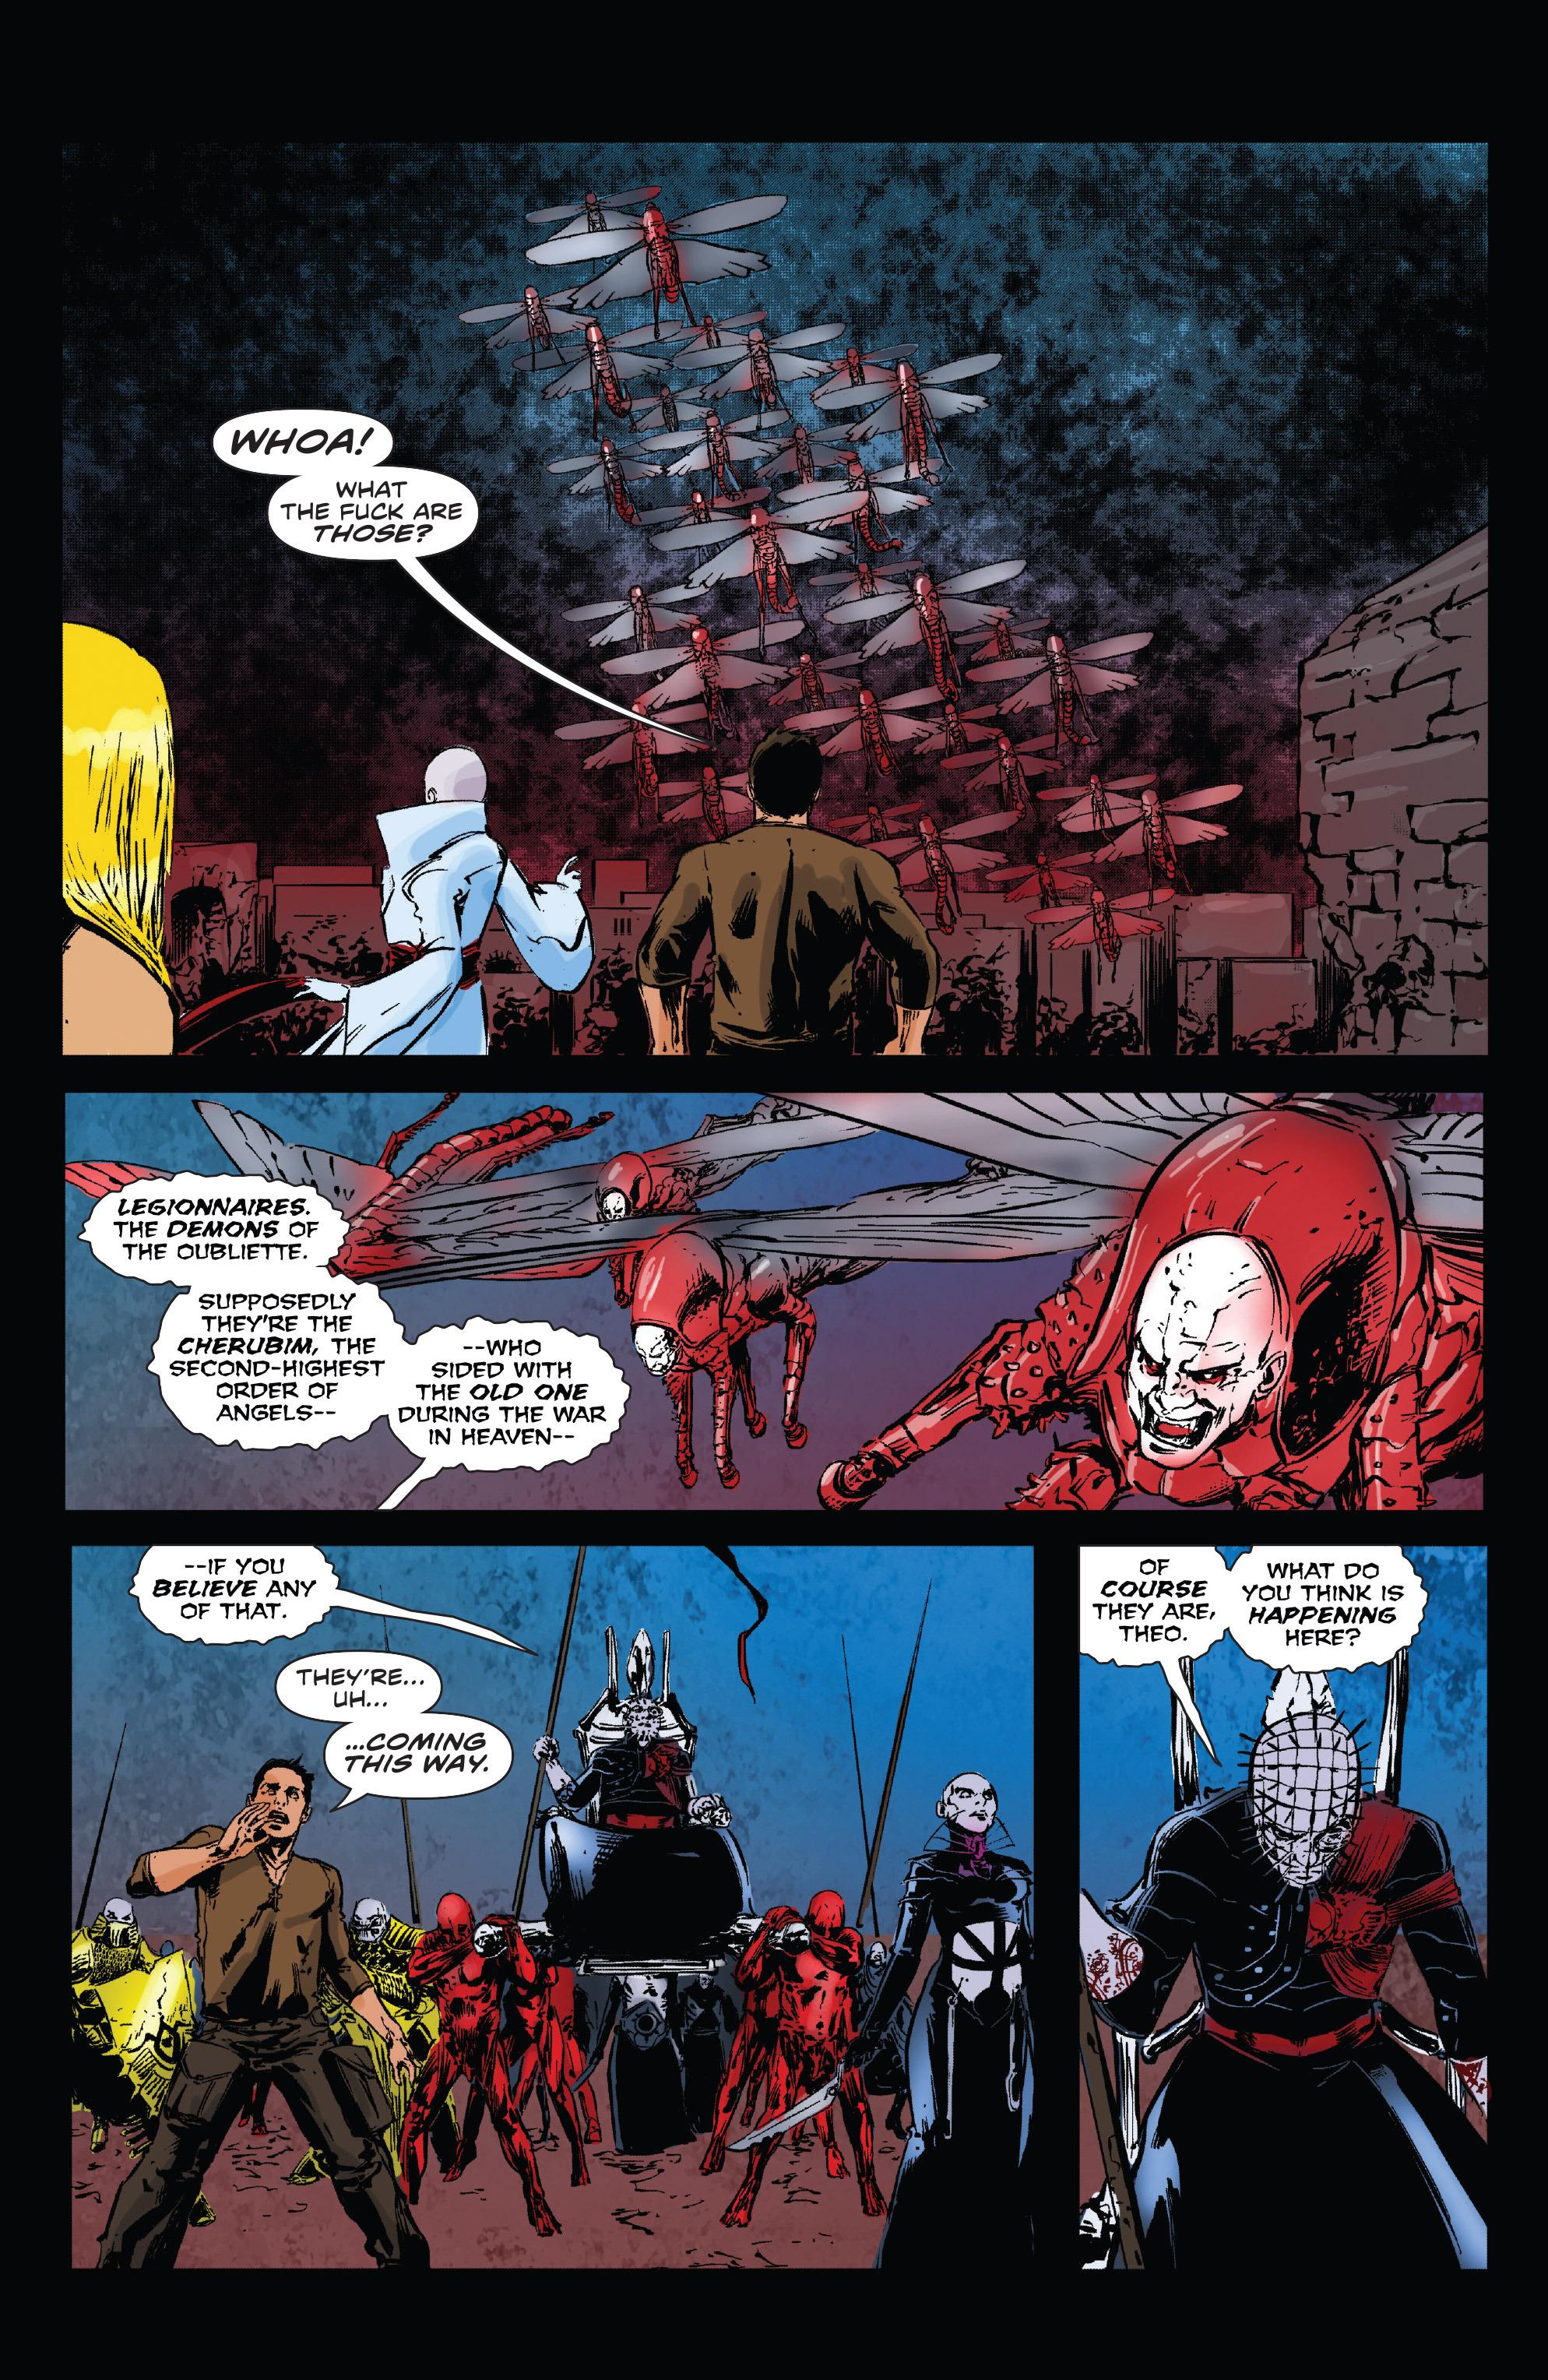 Read online Clive Barker's Hellraiser: The Dark Watch comic -  Issue # TPB 3 - 47